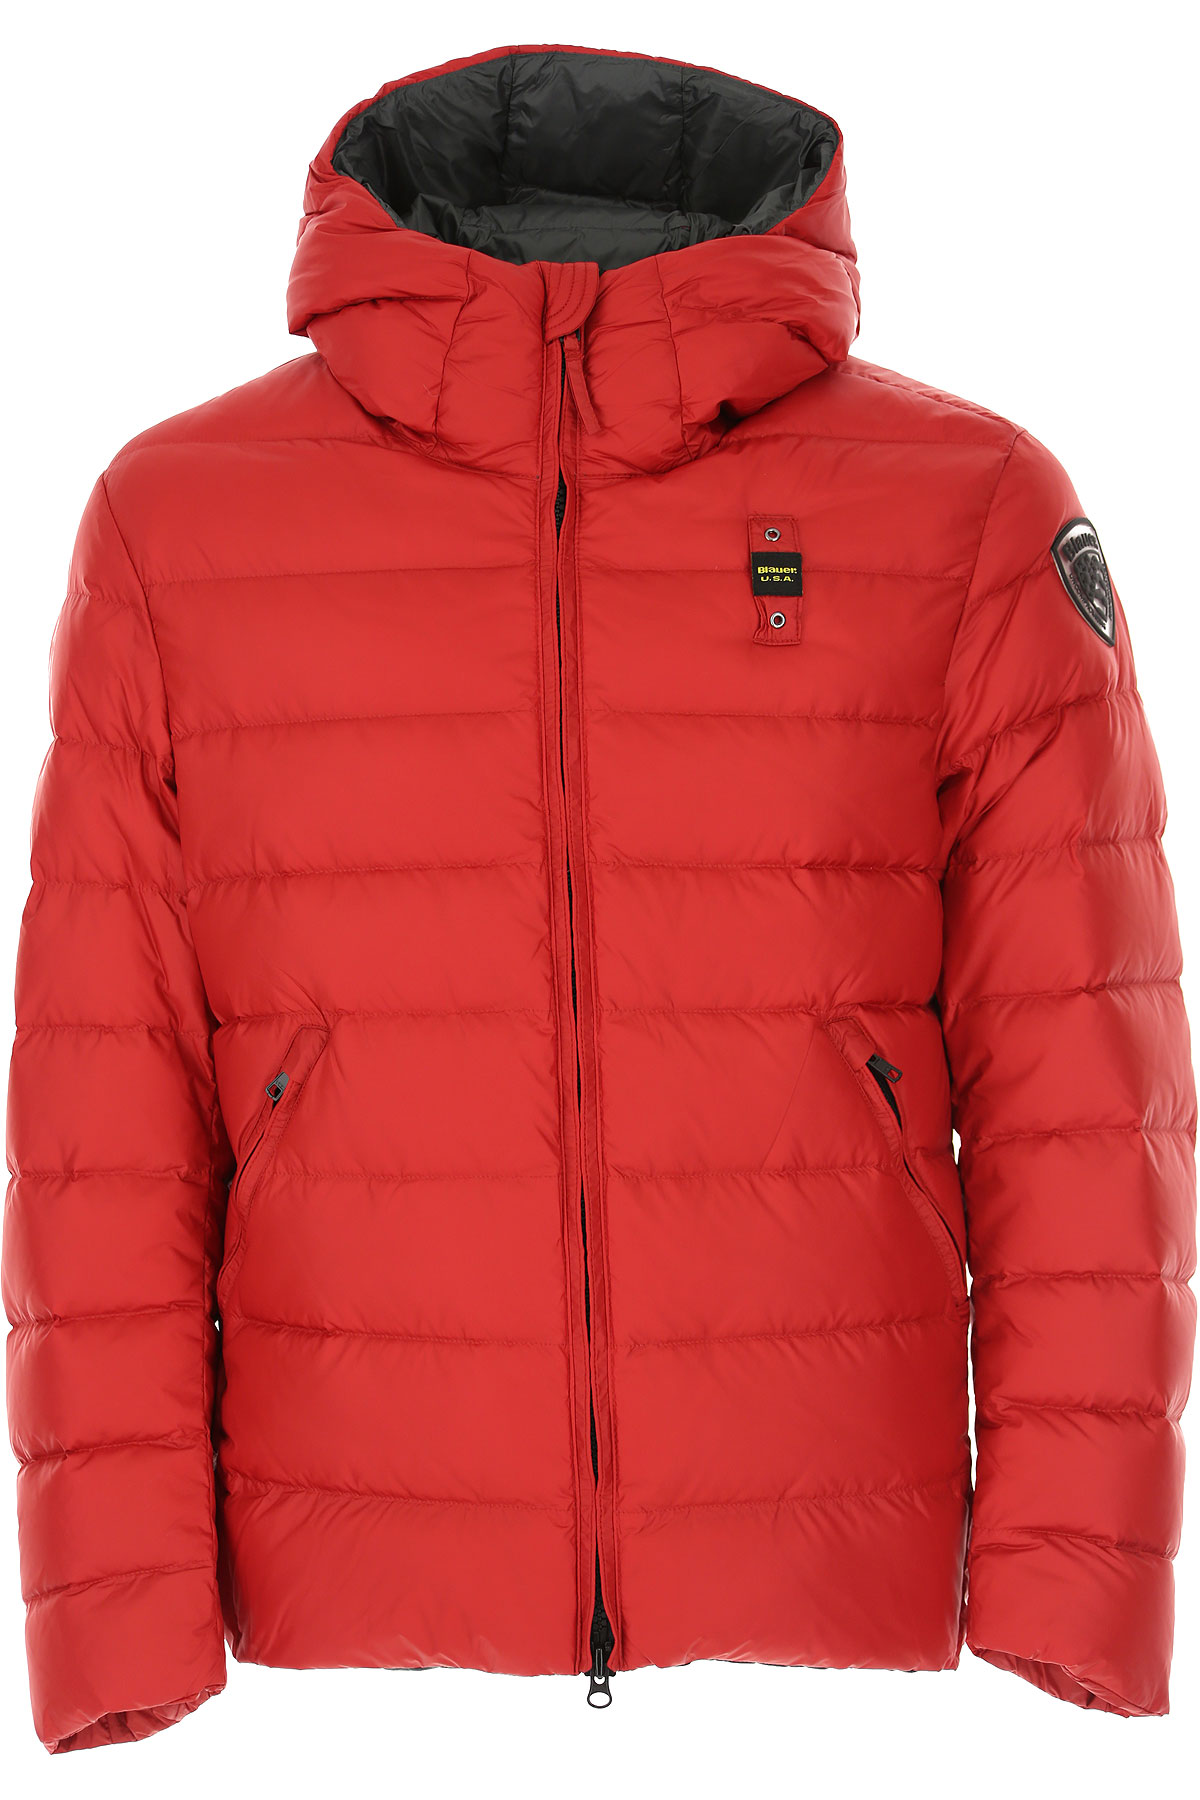 Blauer Down Jacket for Men, Puffer Ski Jacket On Sale, Fire Red, polyamide, 2019, L S